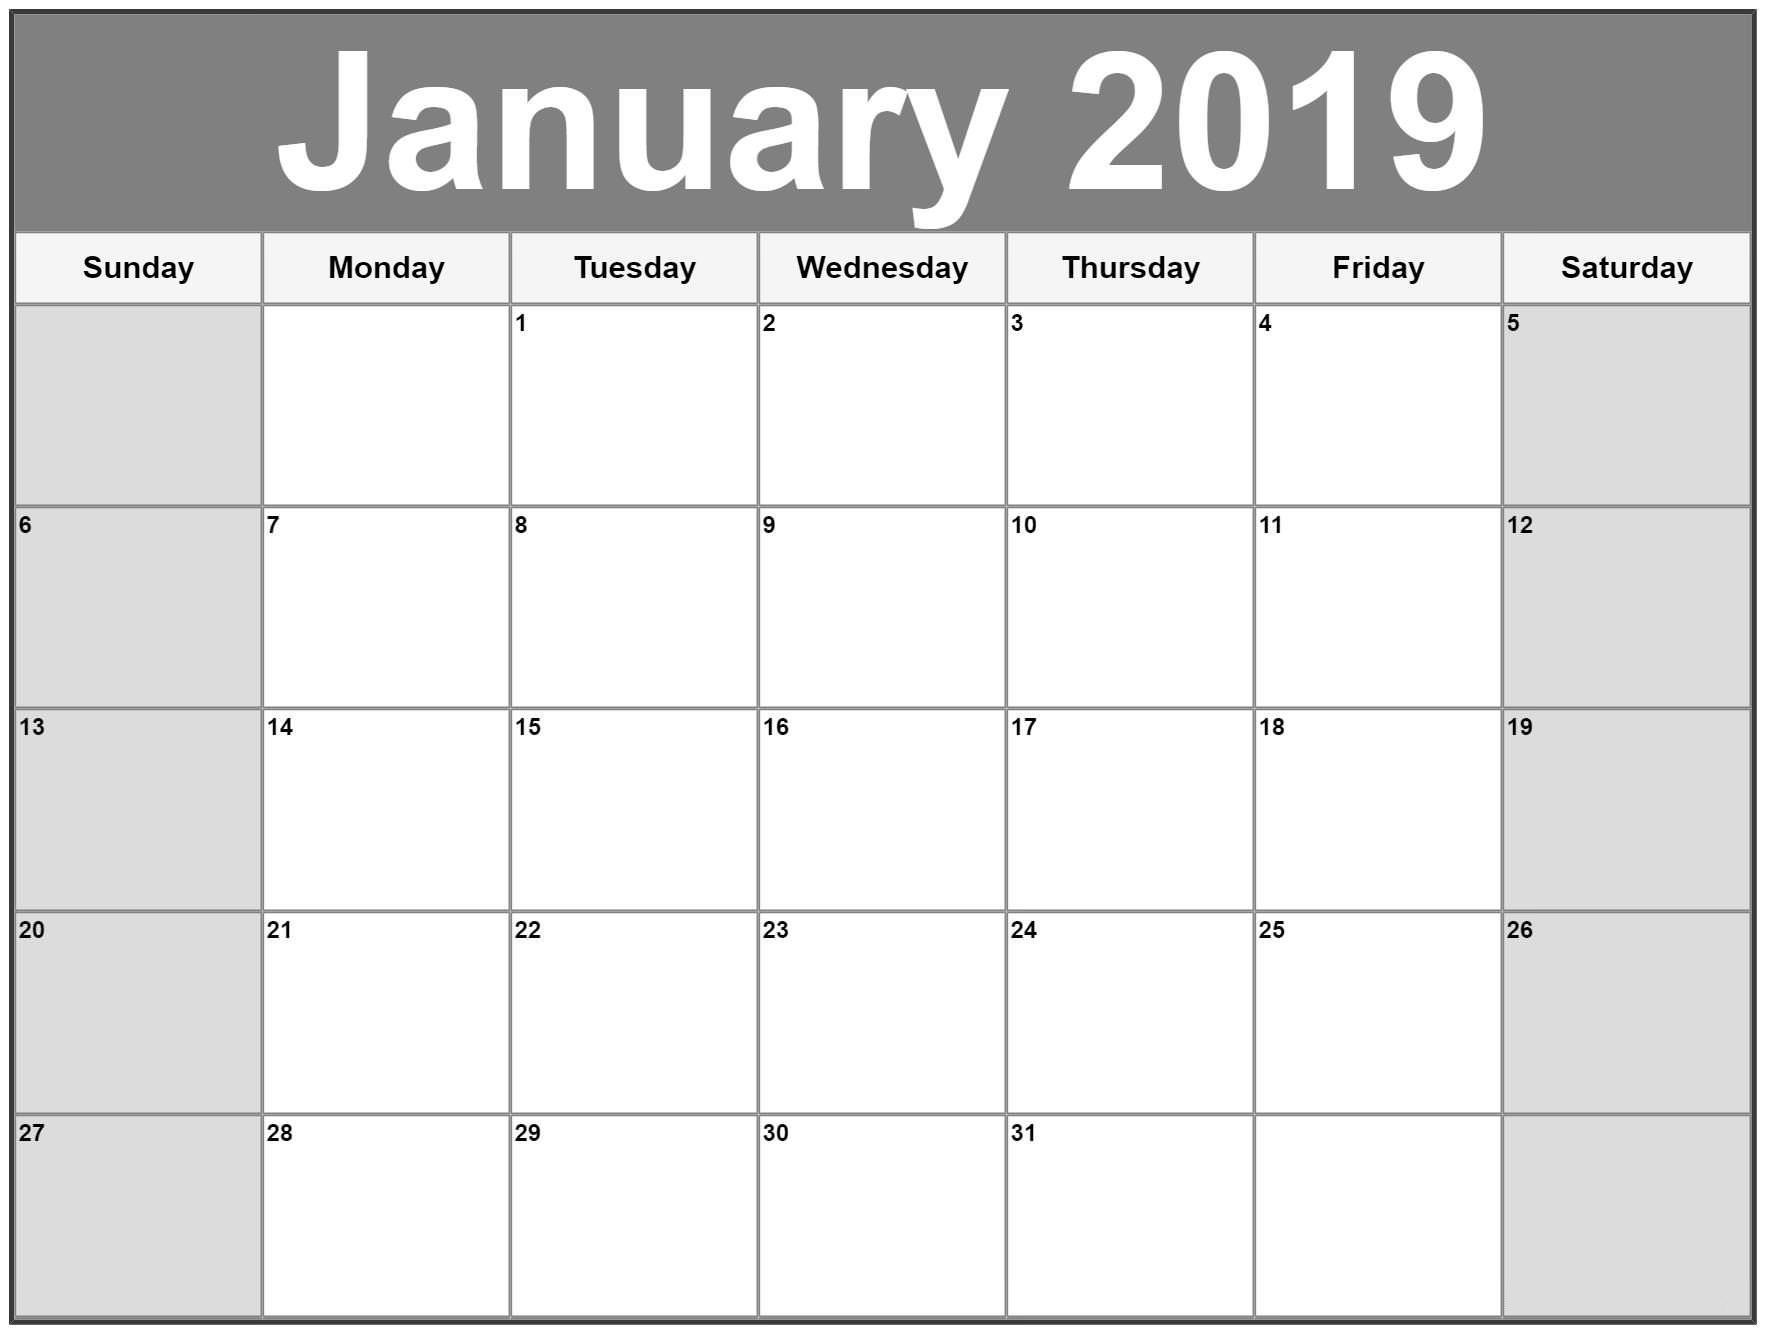 january 2019 islamic calendar january 2019 calendar templates::January 2019 Calendar Canada